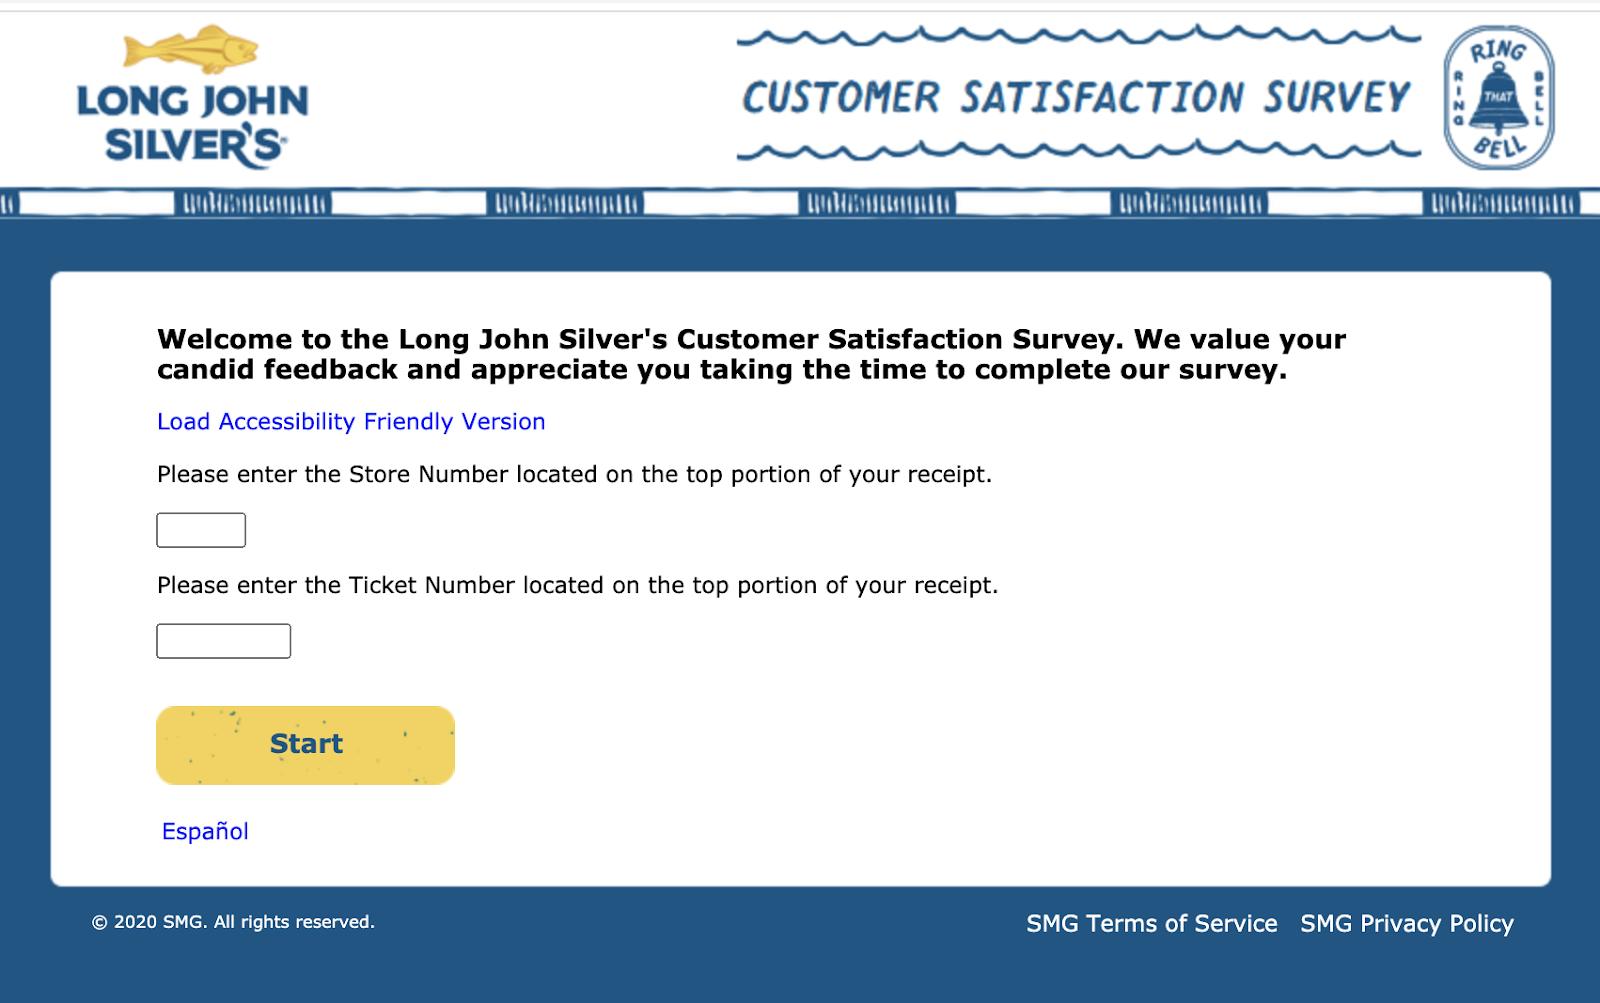 mylongjohnsilversexperience.com survey